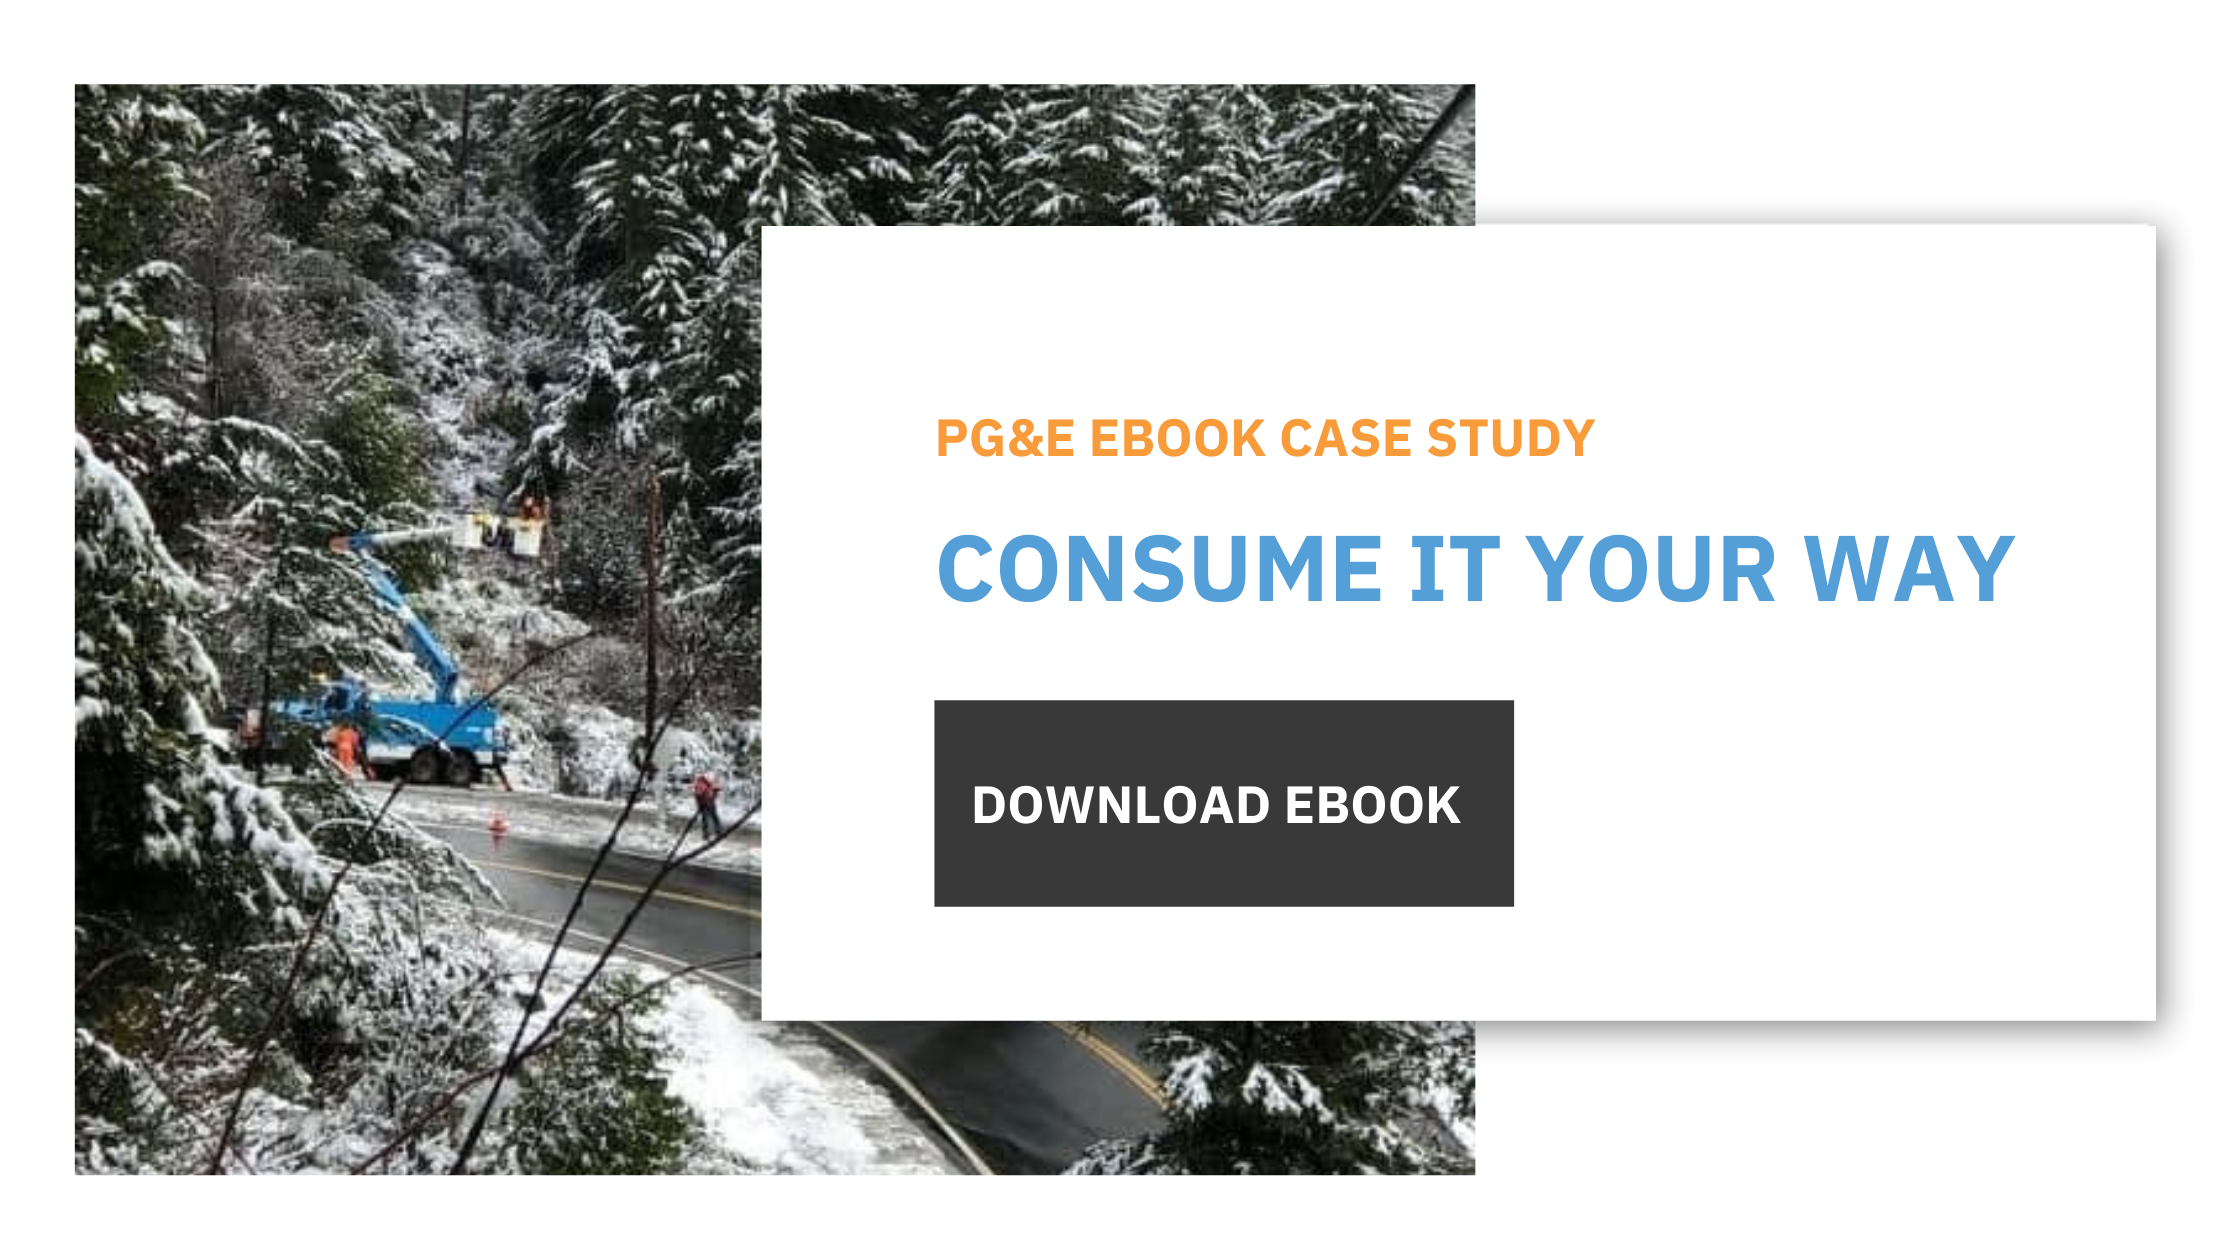 PGE Case study download